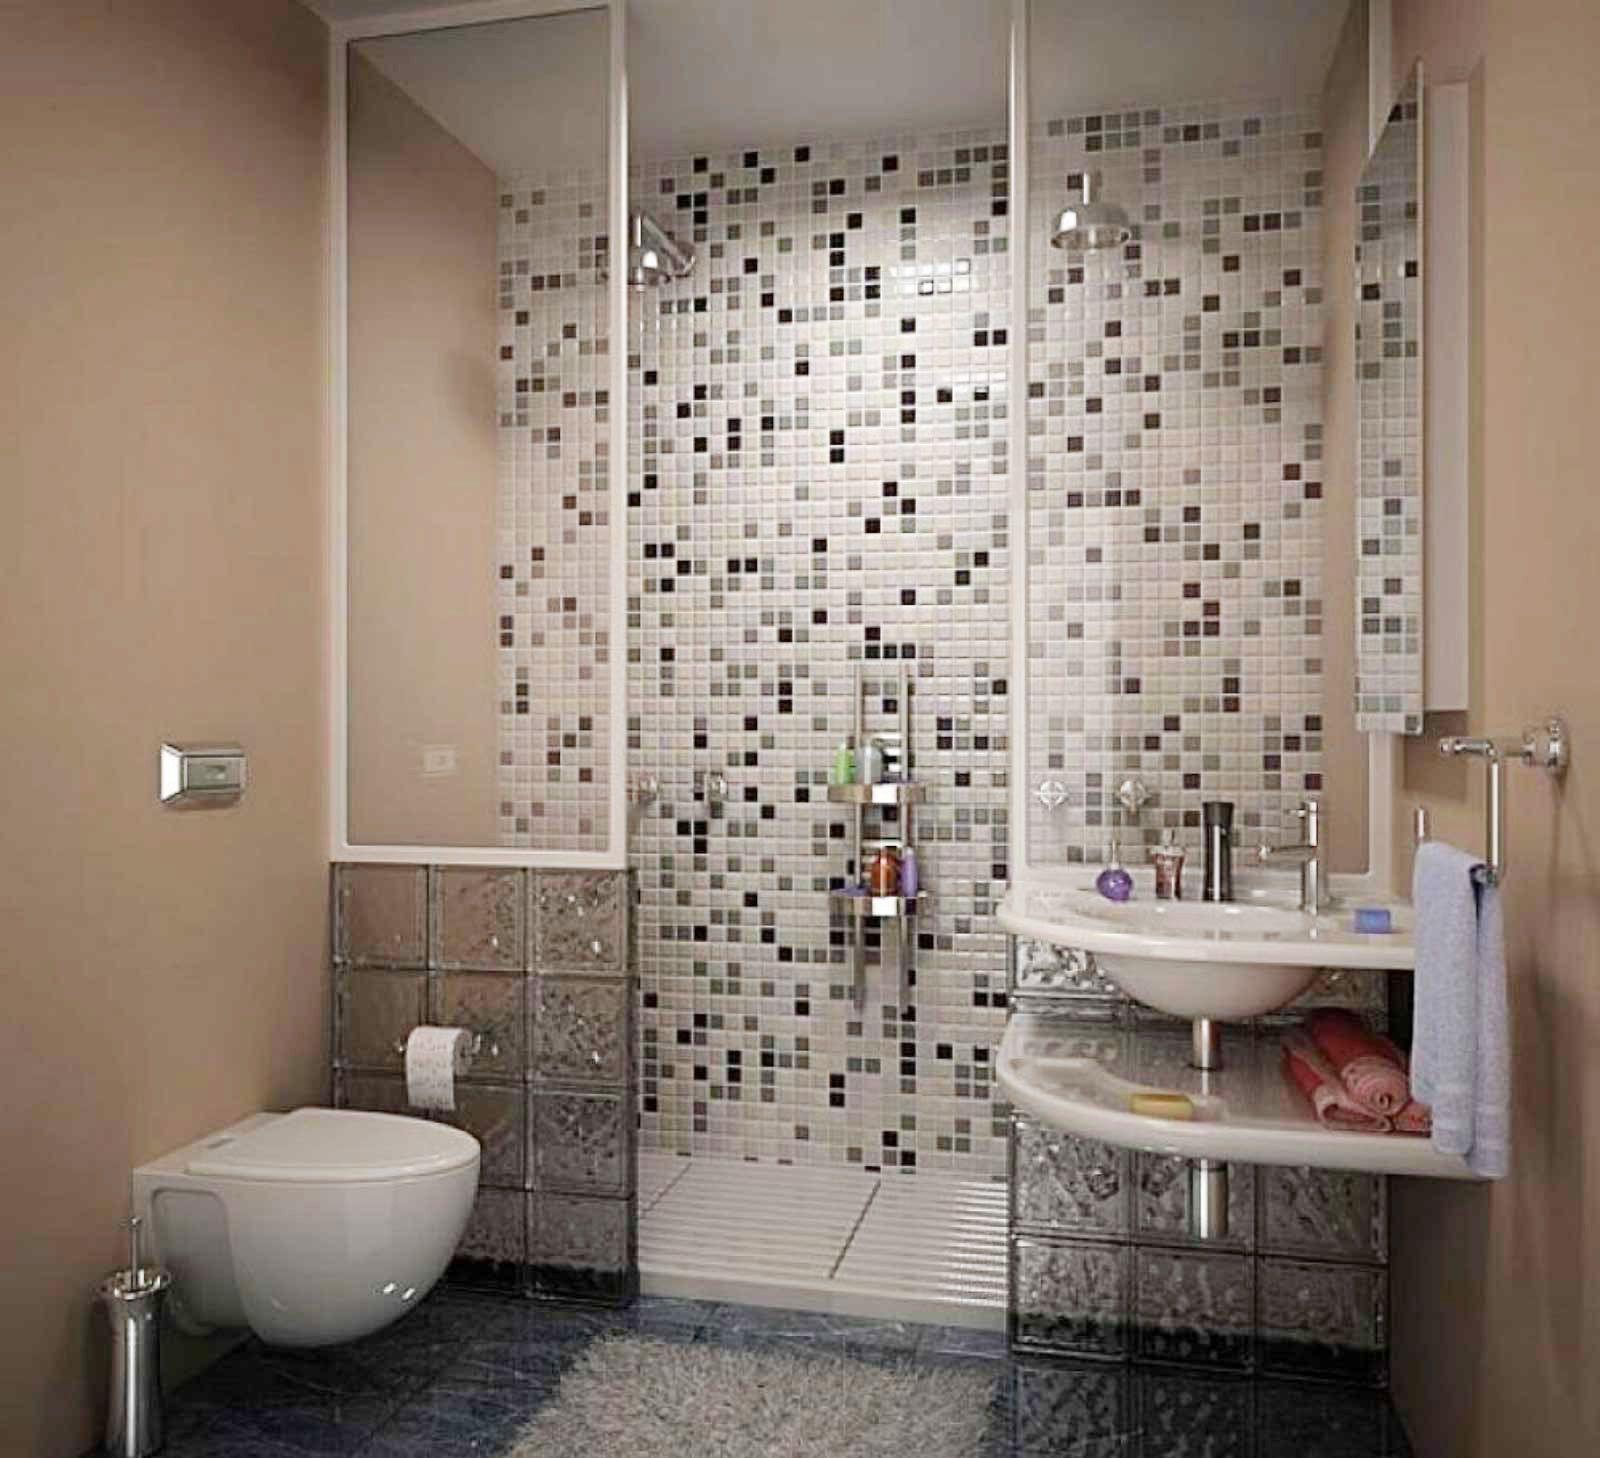 Bathroom ideas for small bathroom | bathroom design 2017 ...